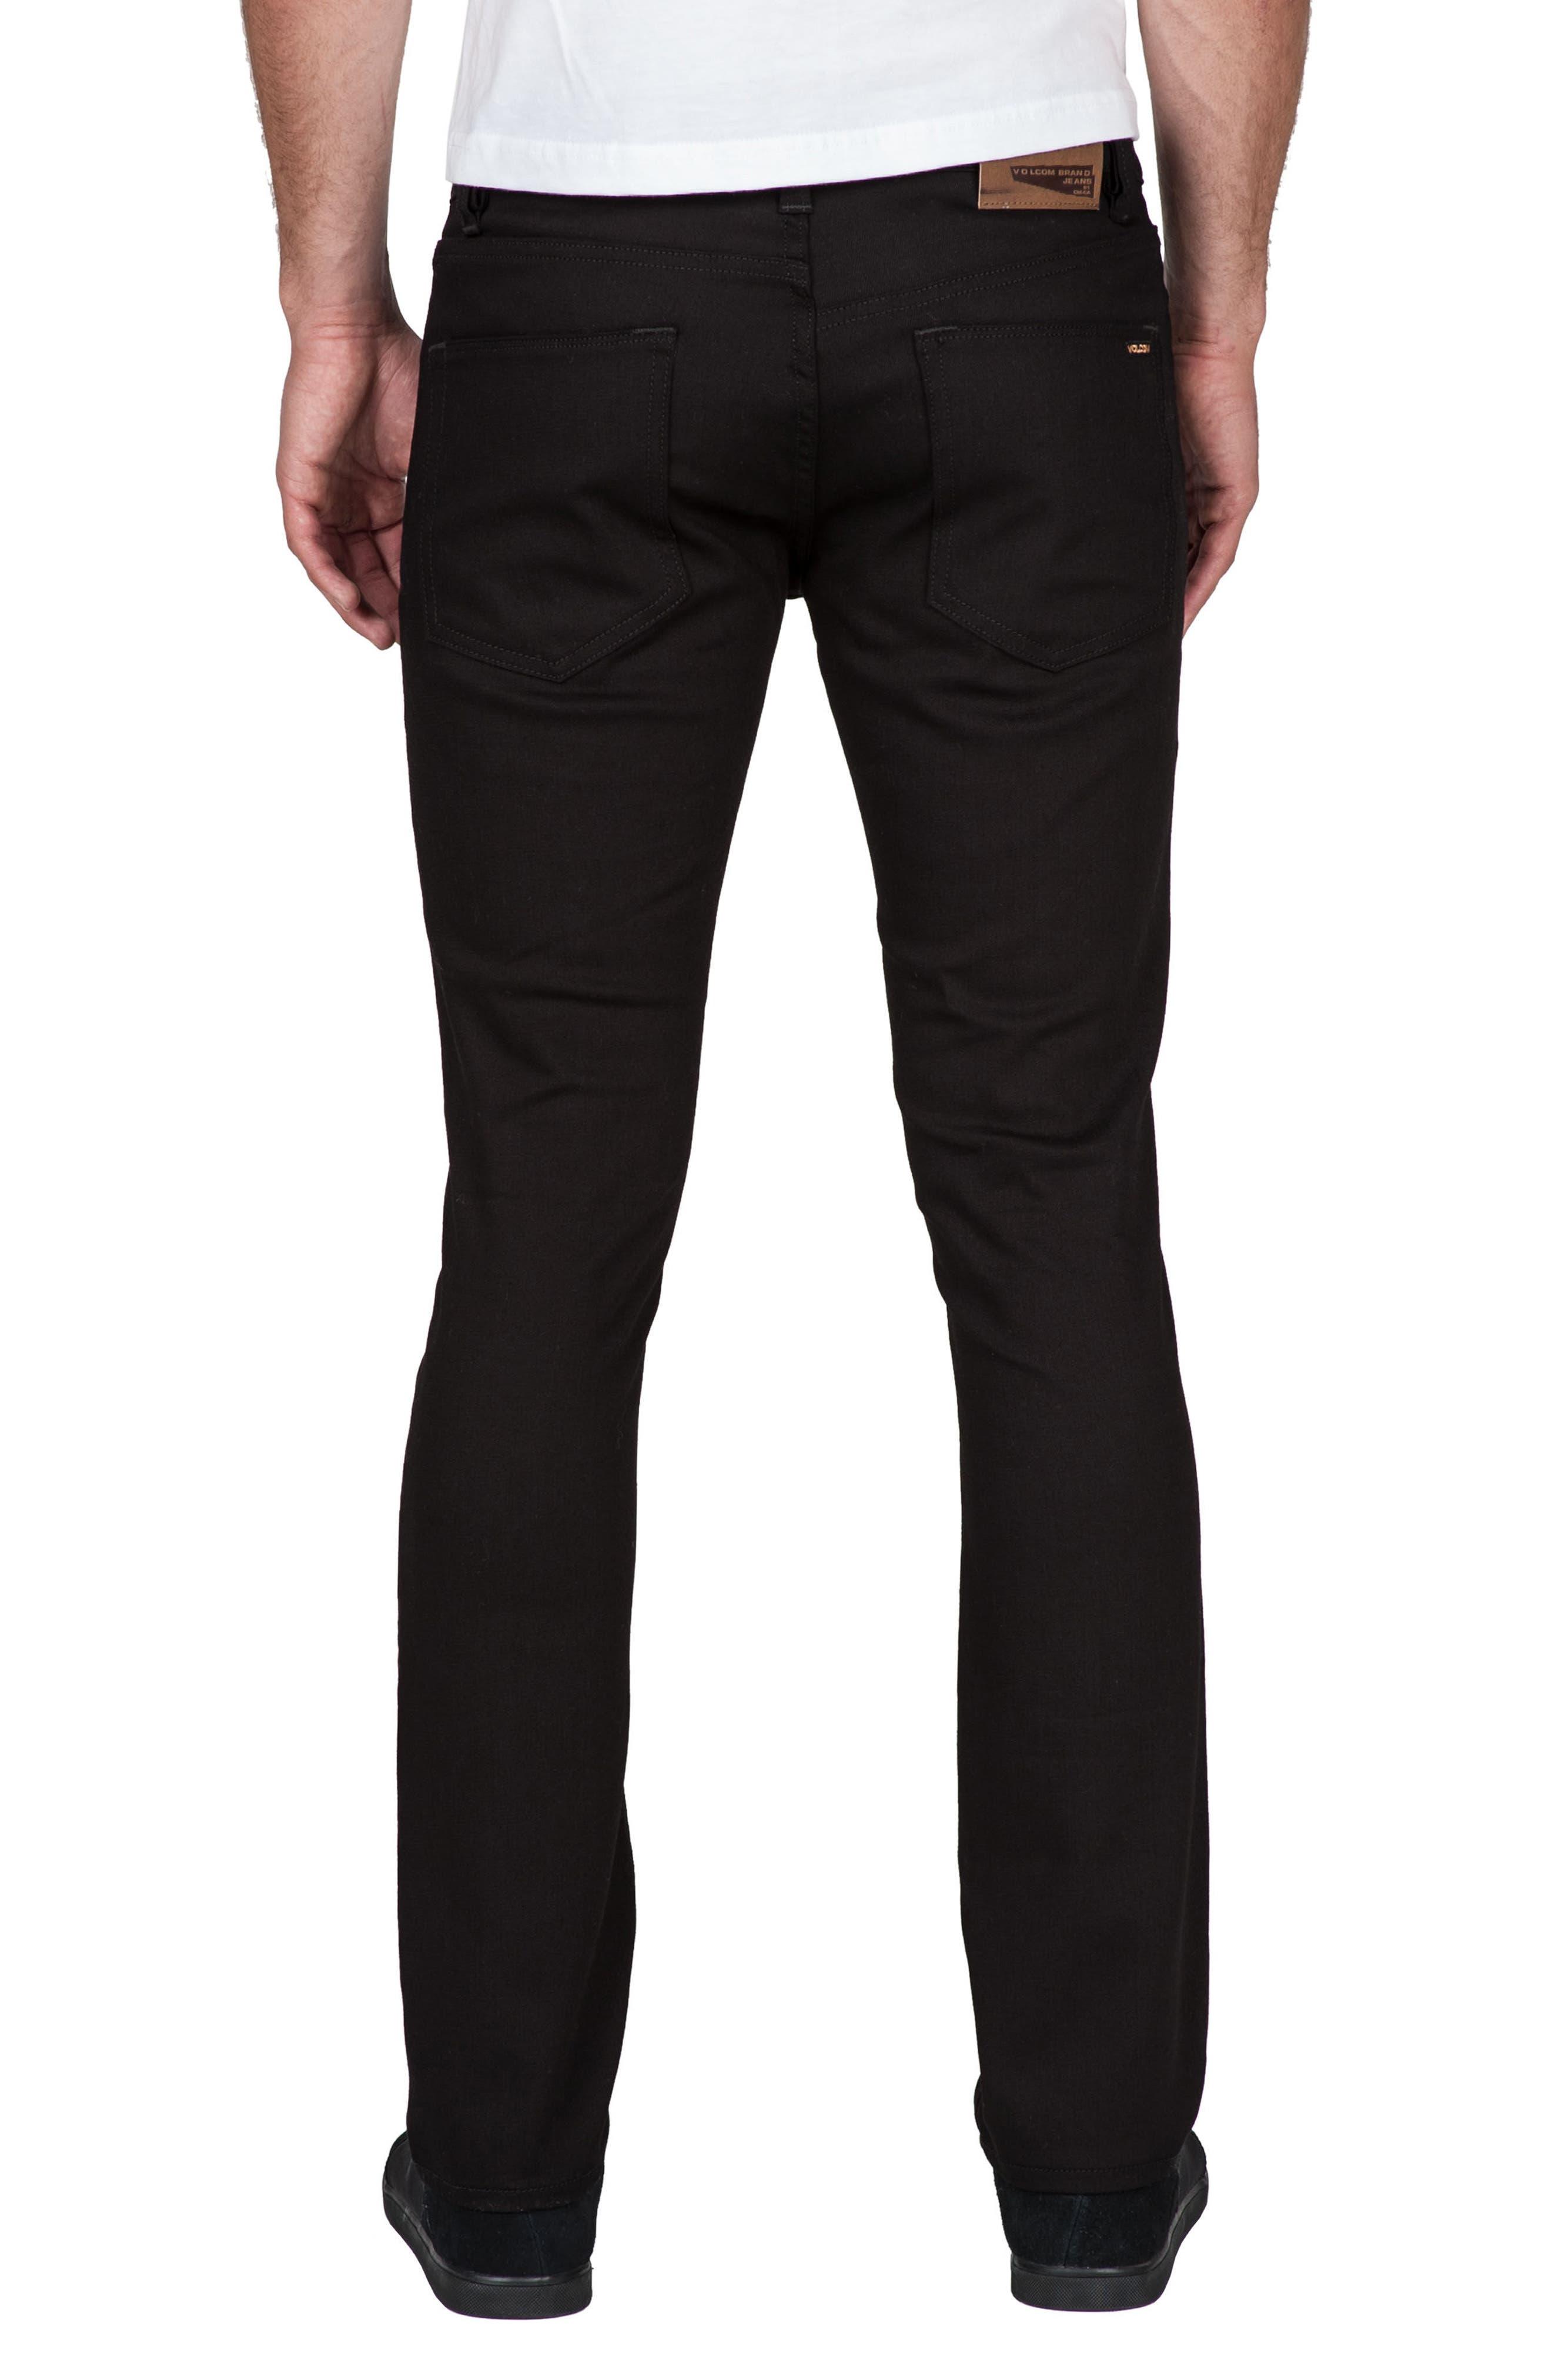 2x4 Slim Straight Leg Jeans,                             Alternate thumbnail 2, color,                             BLACK BLACK